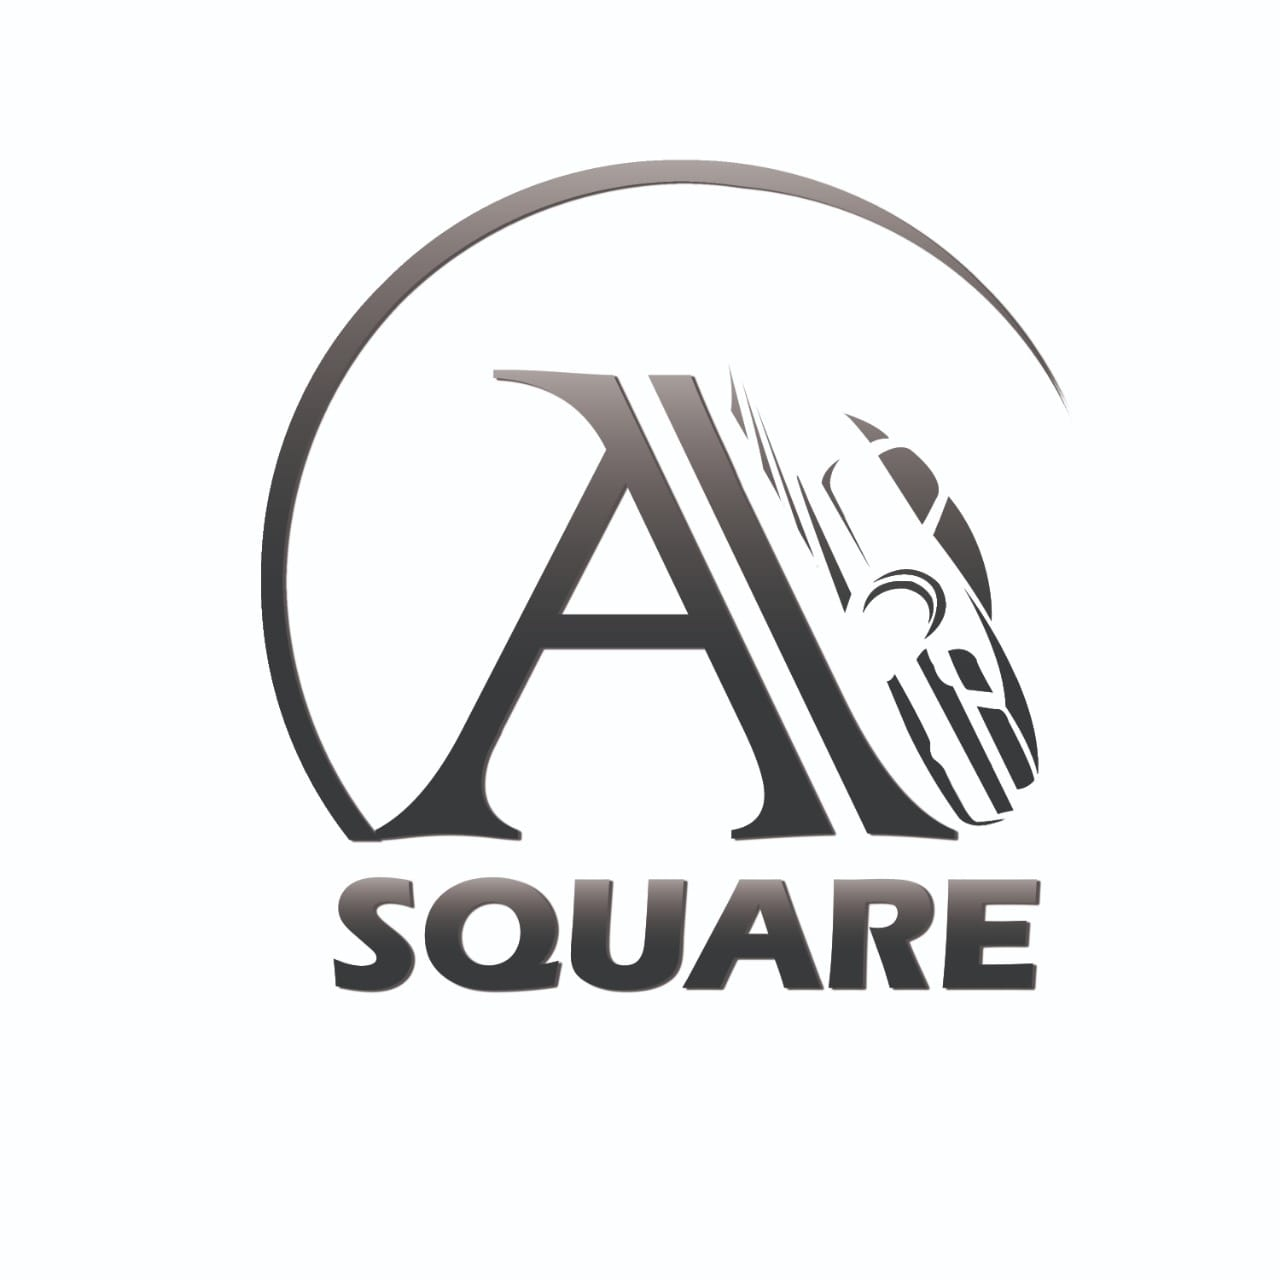 A-SQUARE-CENTER